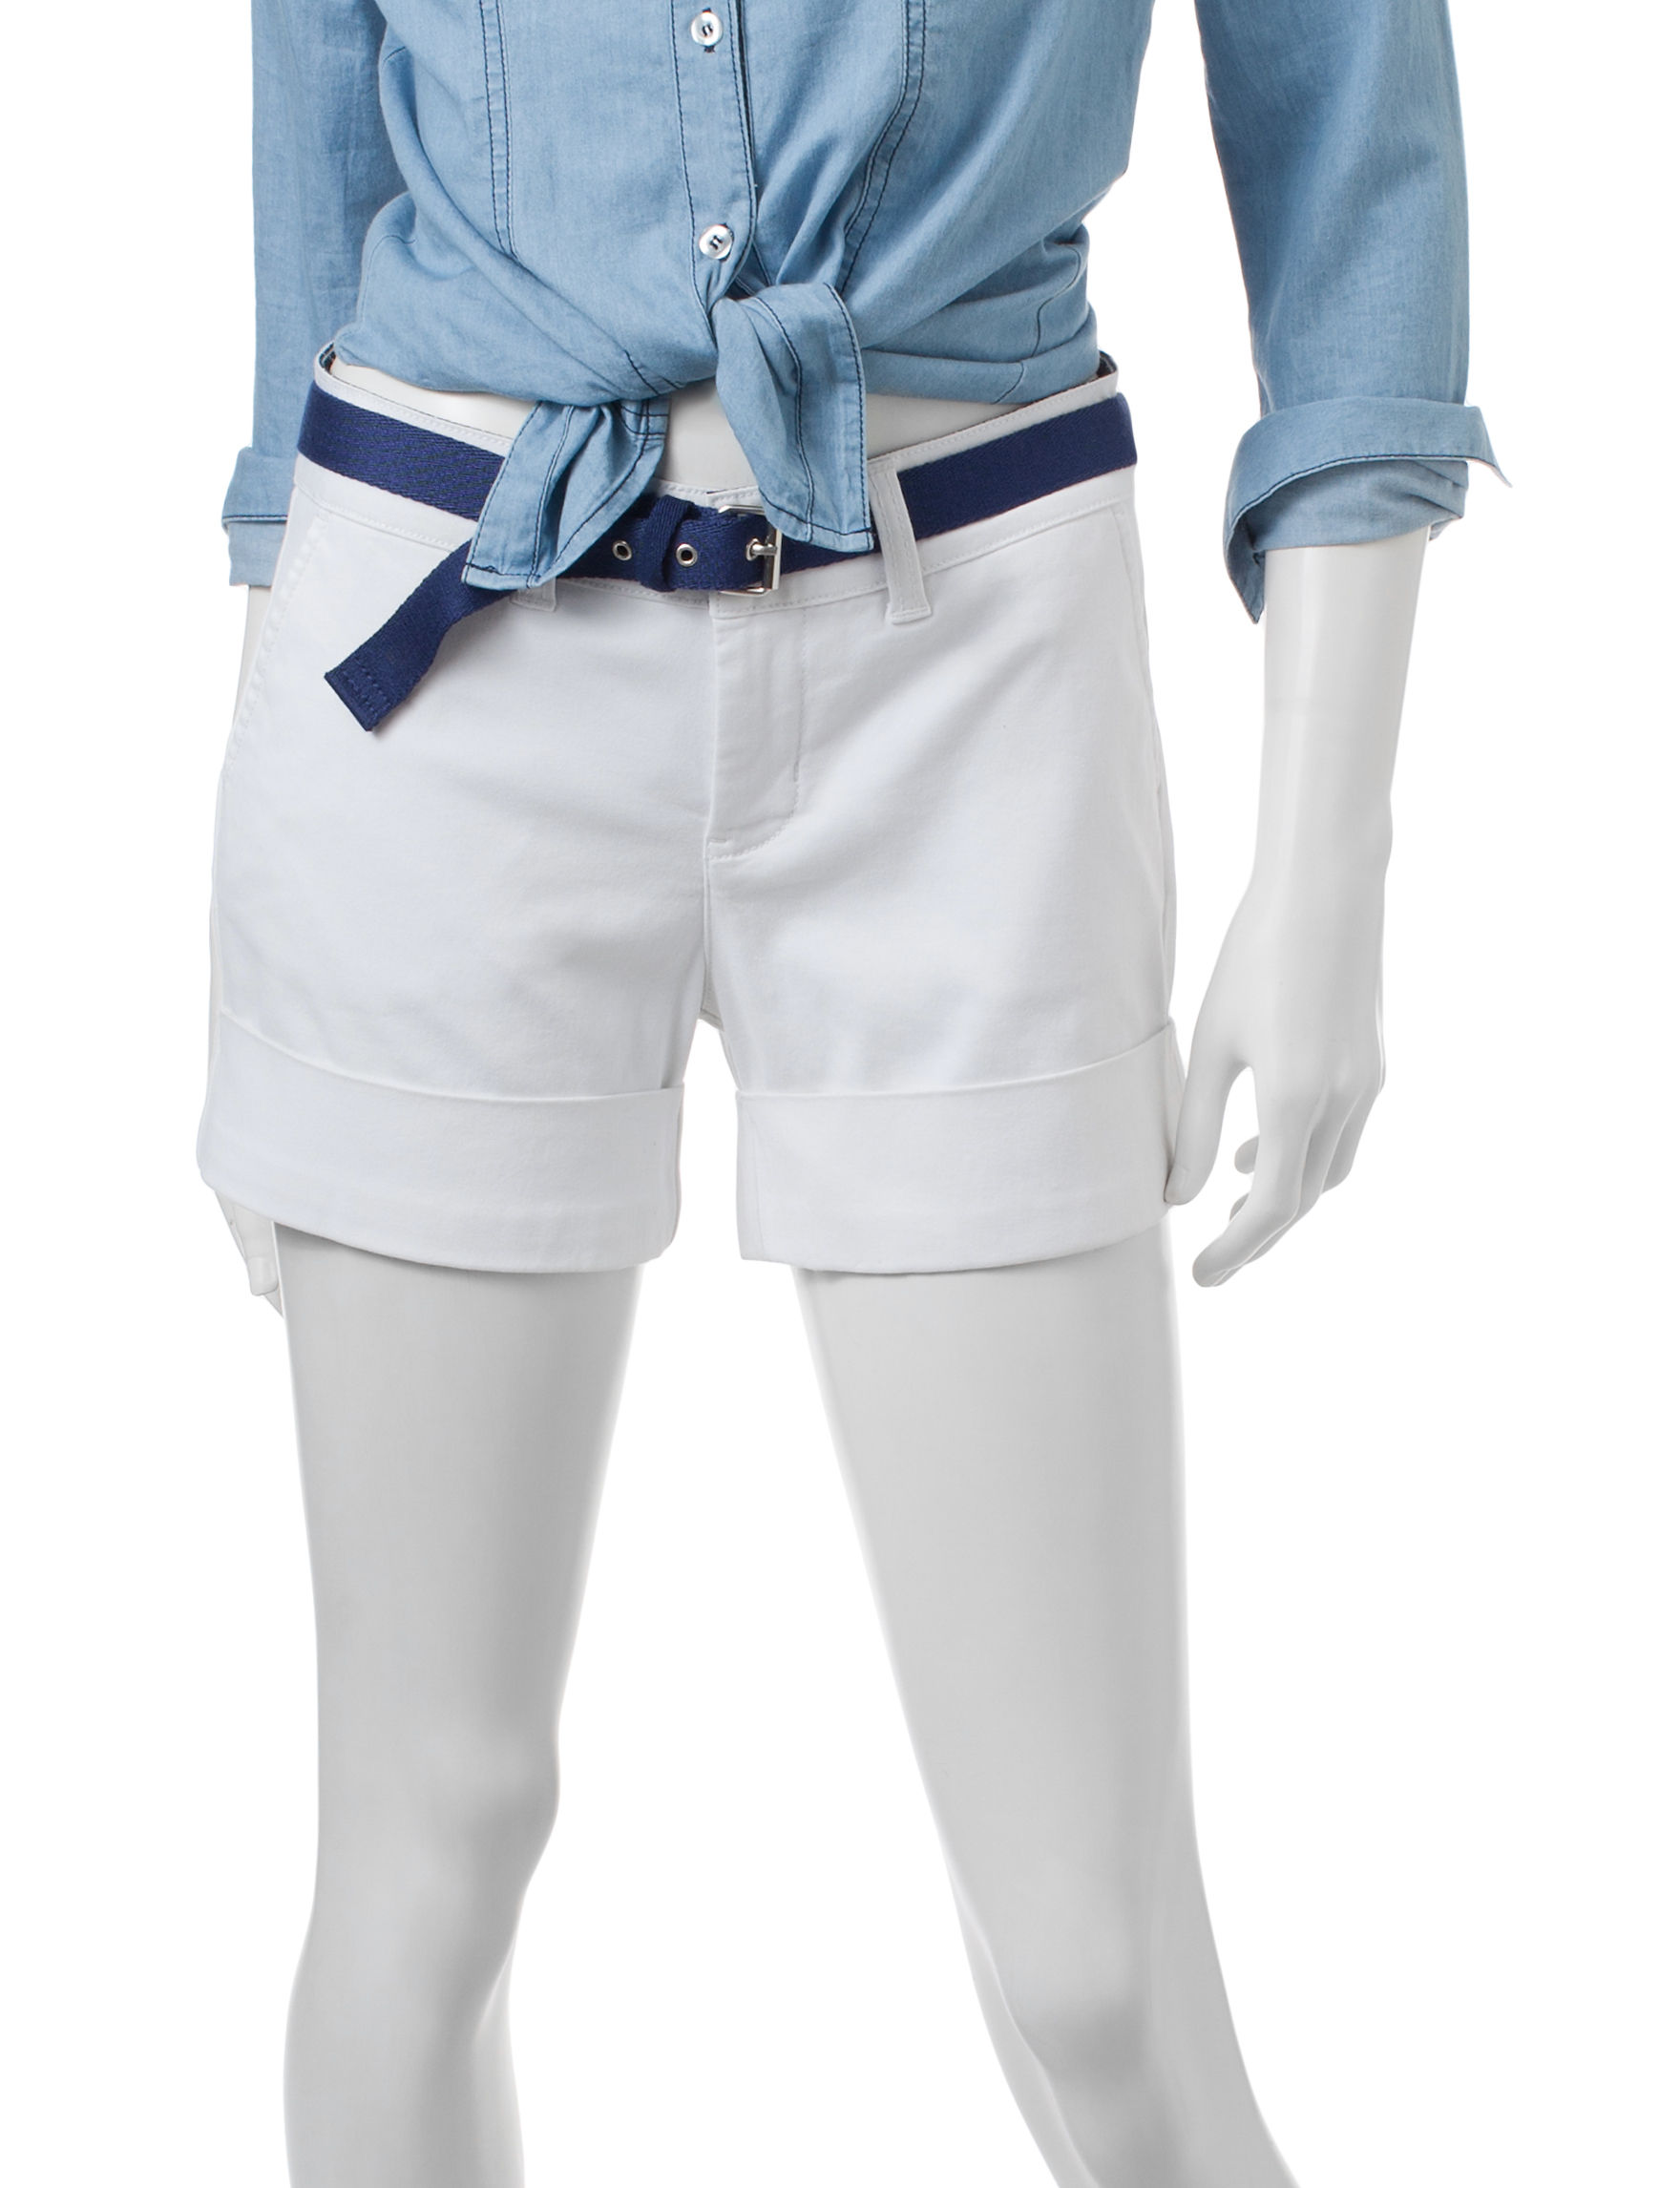 U.S. Polo Assn. White Tailored Shorts